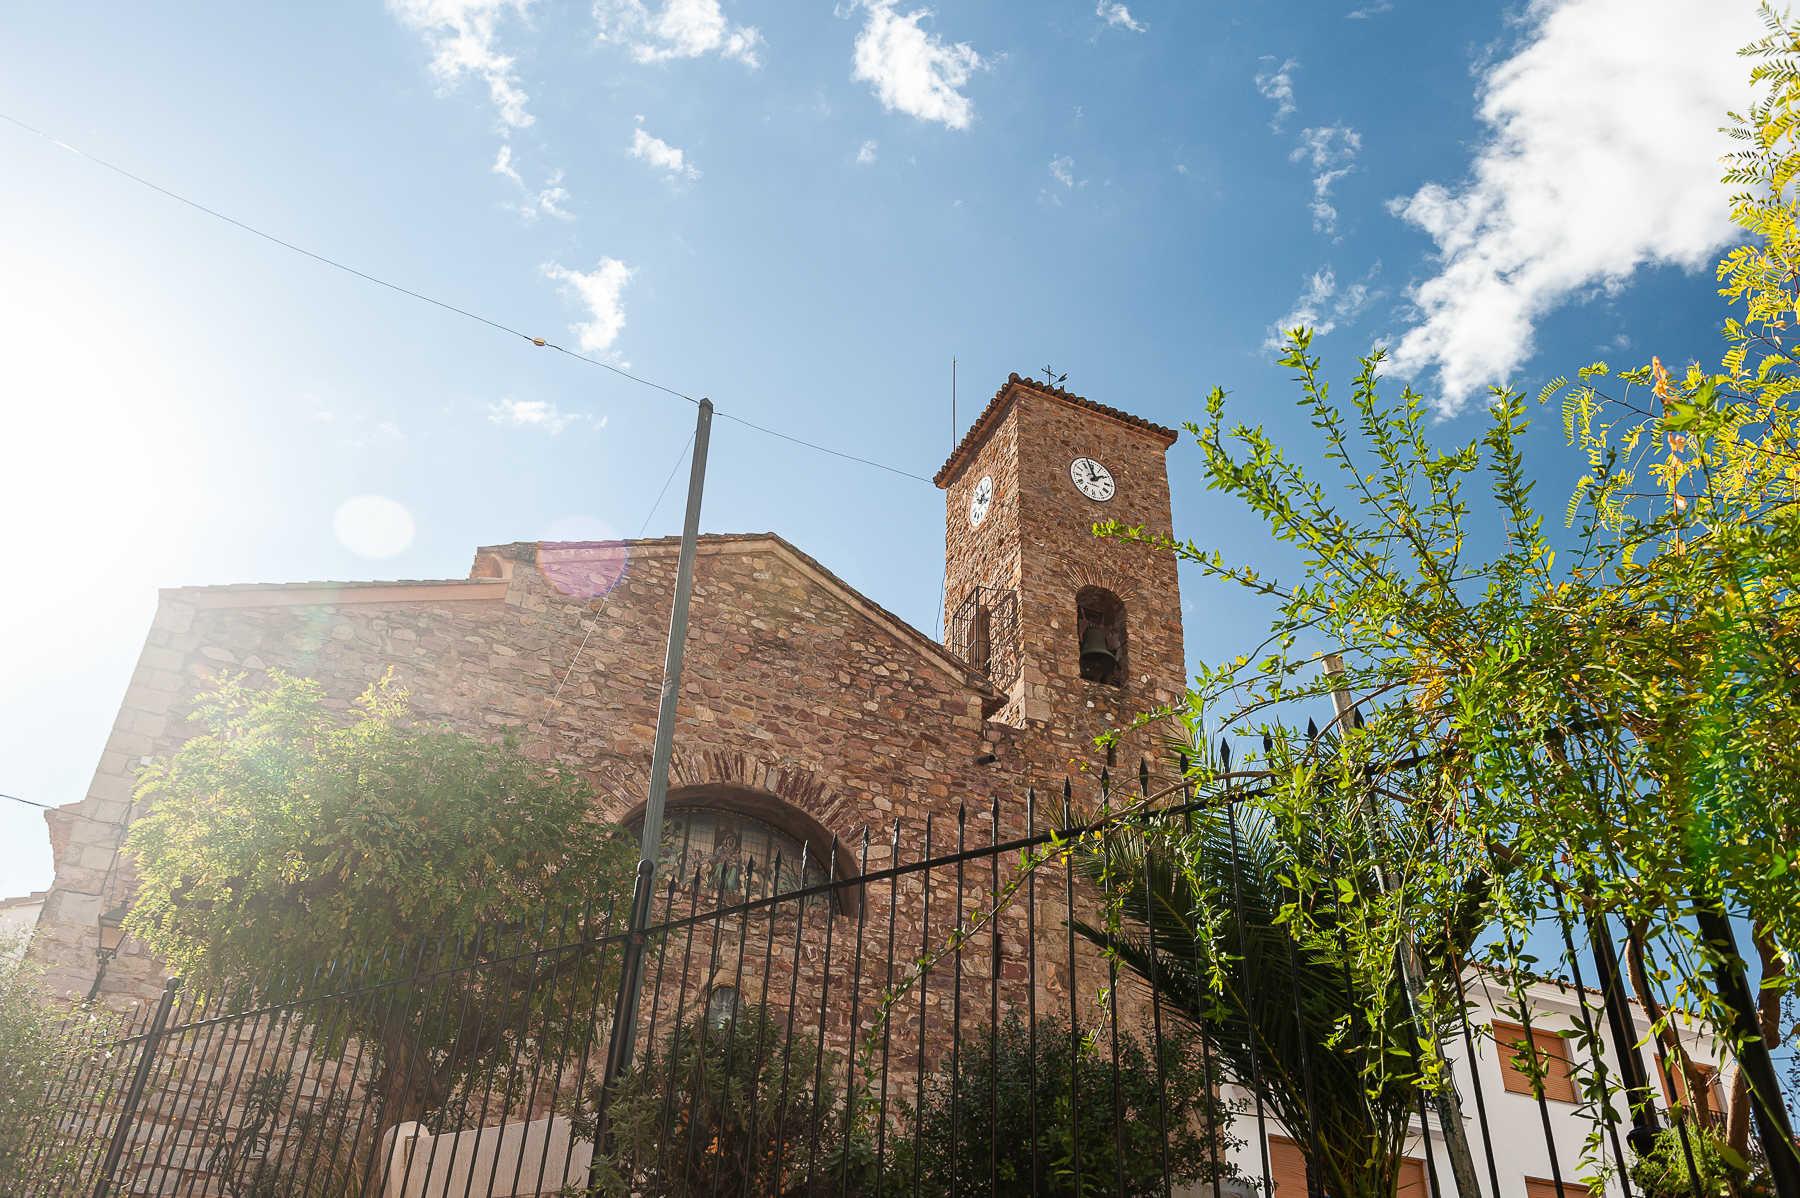 https://multimedia.comunitatvalenciana.com/52C505CC525544D59D0EEB2CB246FFCB/img/A657DB5B31B64760AF9CE569CE9006AB/2027-Almedijar-Iglesia_Nuestra_Senora_Angeles-0294.jpg?responsive